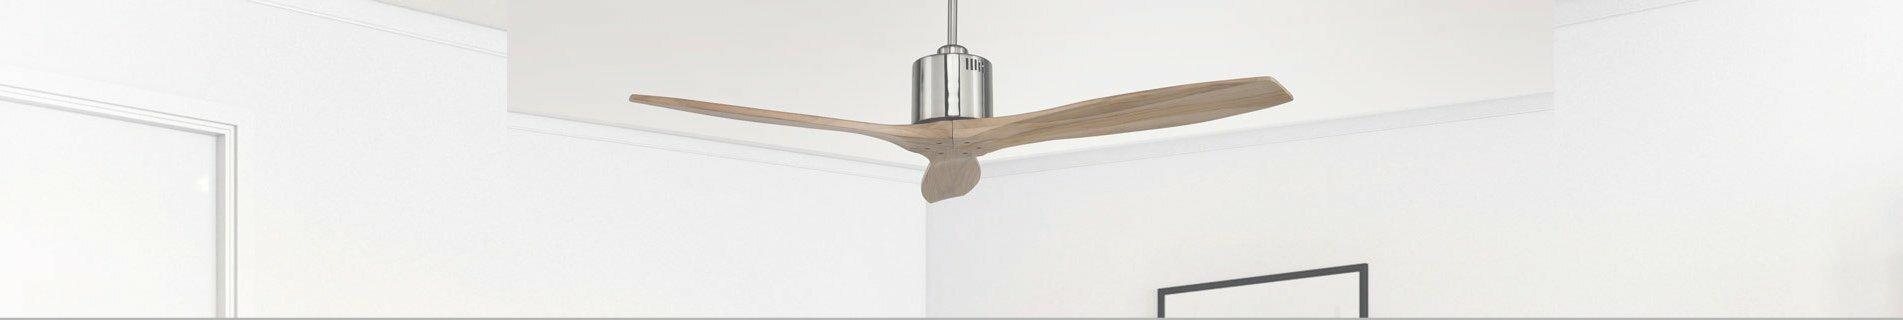 Ceiling Fan Extension Rods